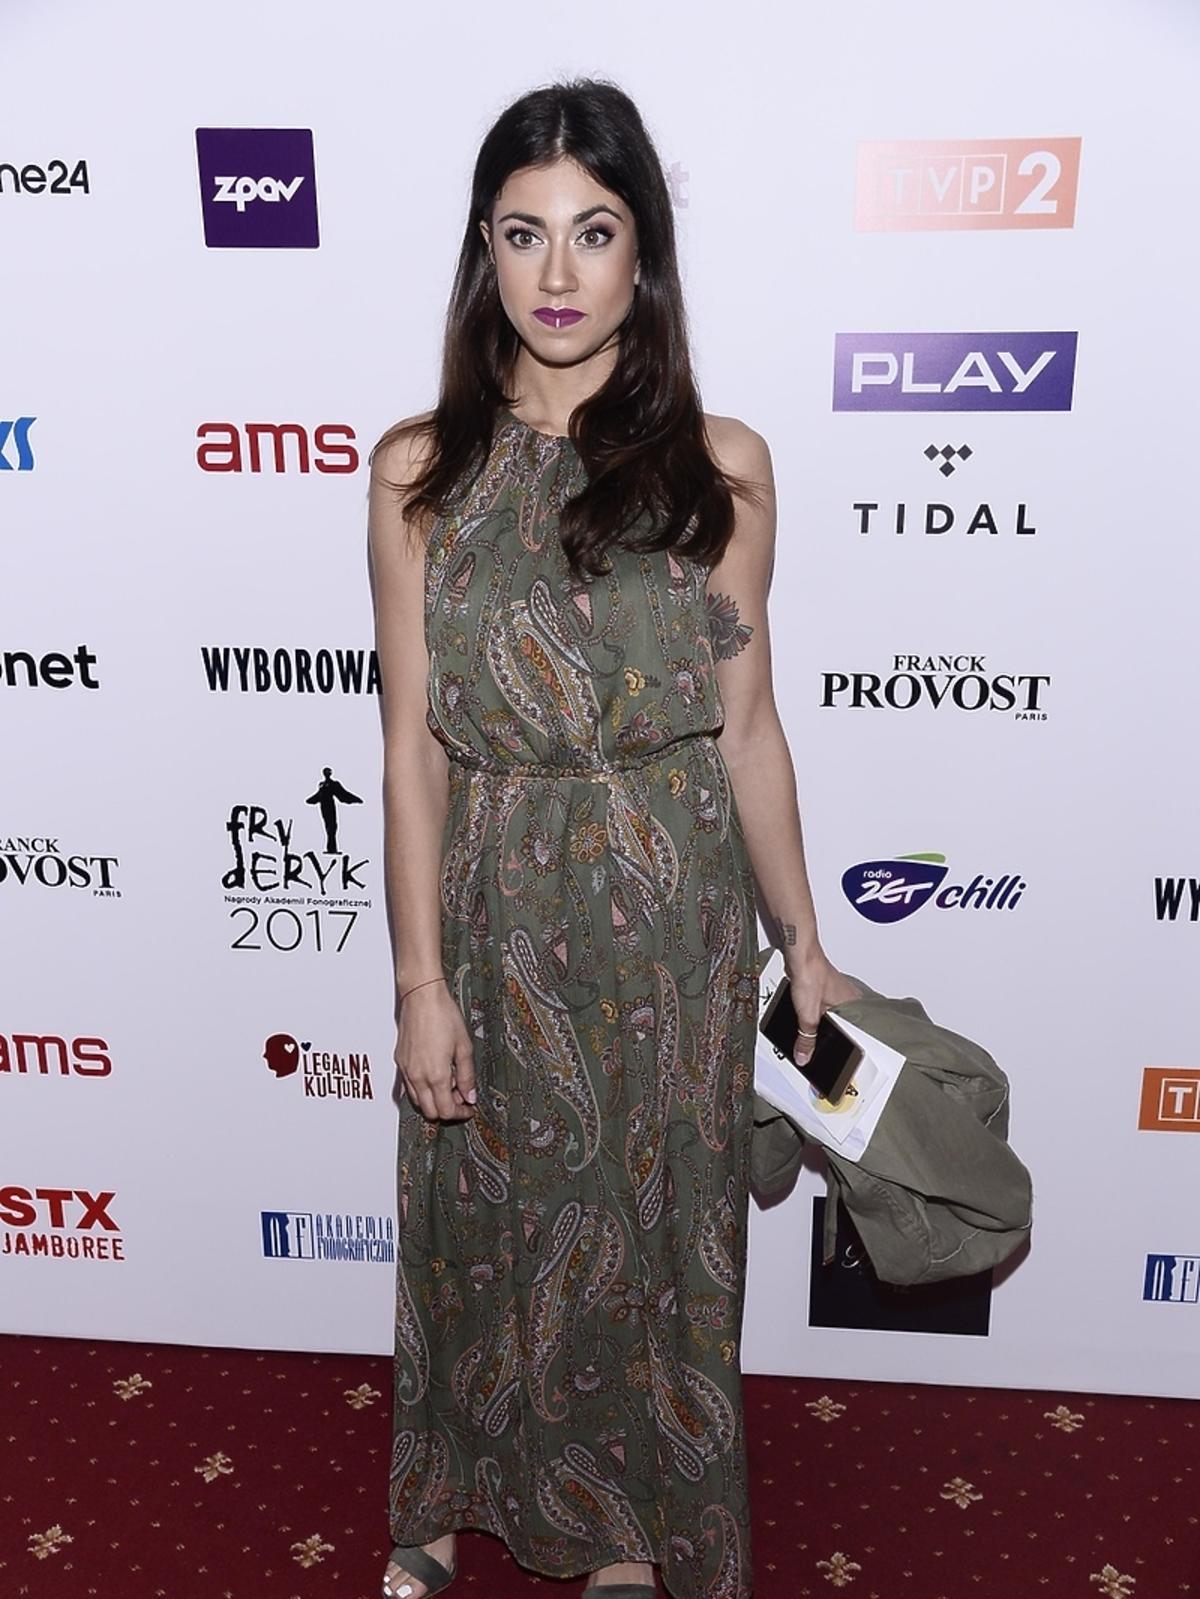 Maja Hyży podczas gali Fryderyki 2017